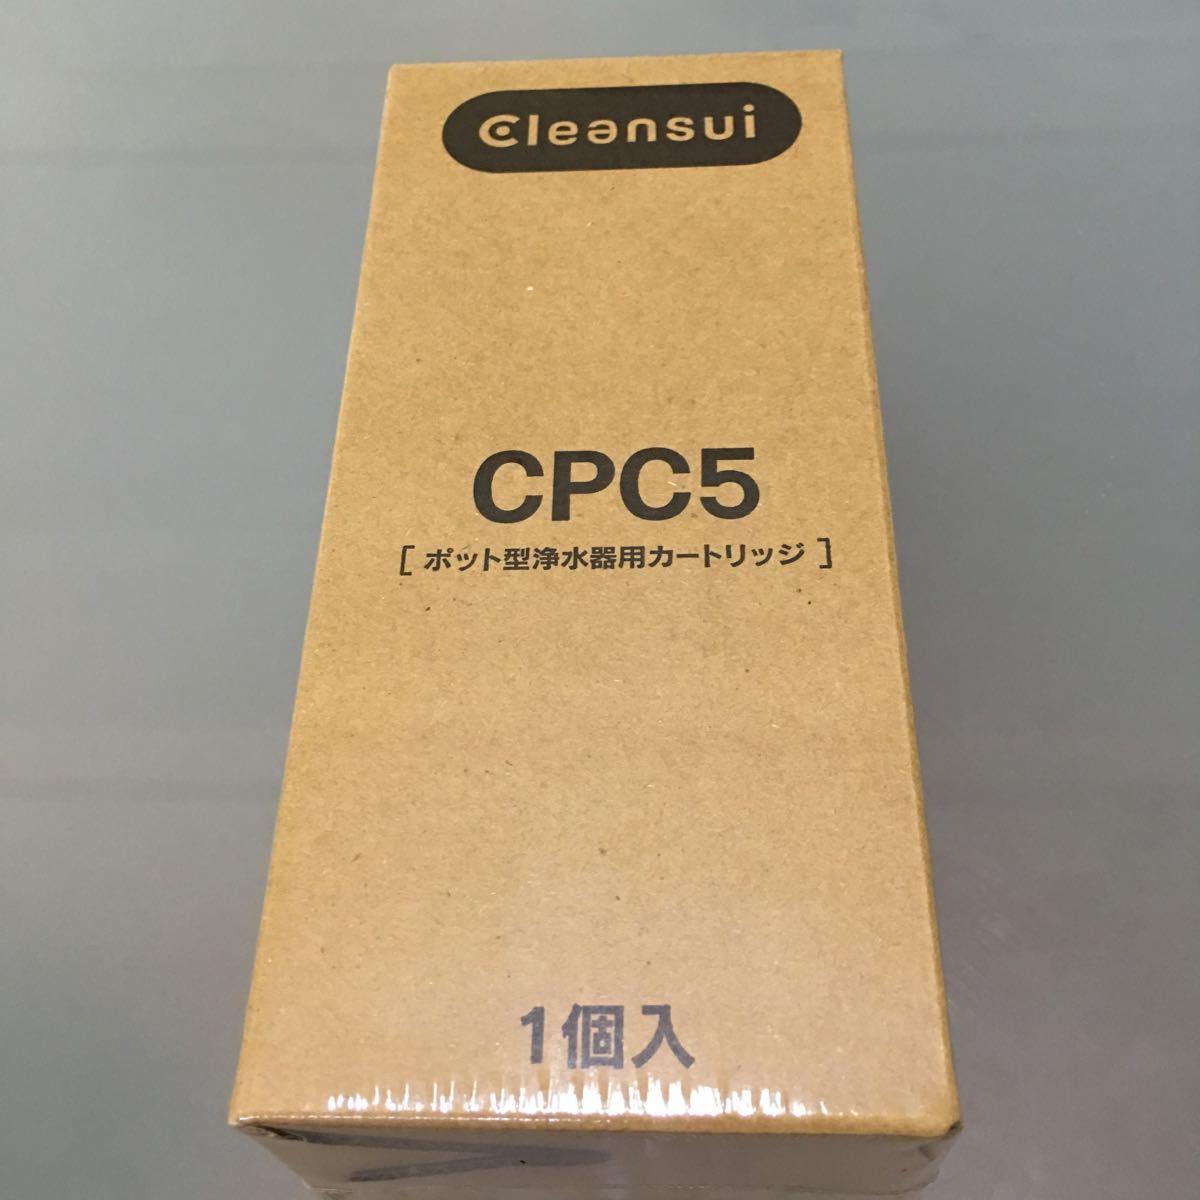 Cleansui ポット型浄水器用カートリッジ CPC5 クリンスイ 新品未使用_画像1